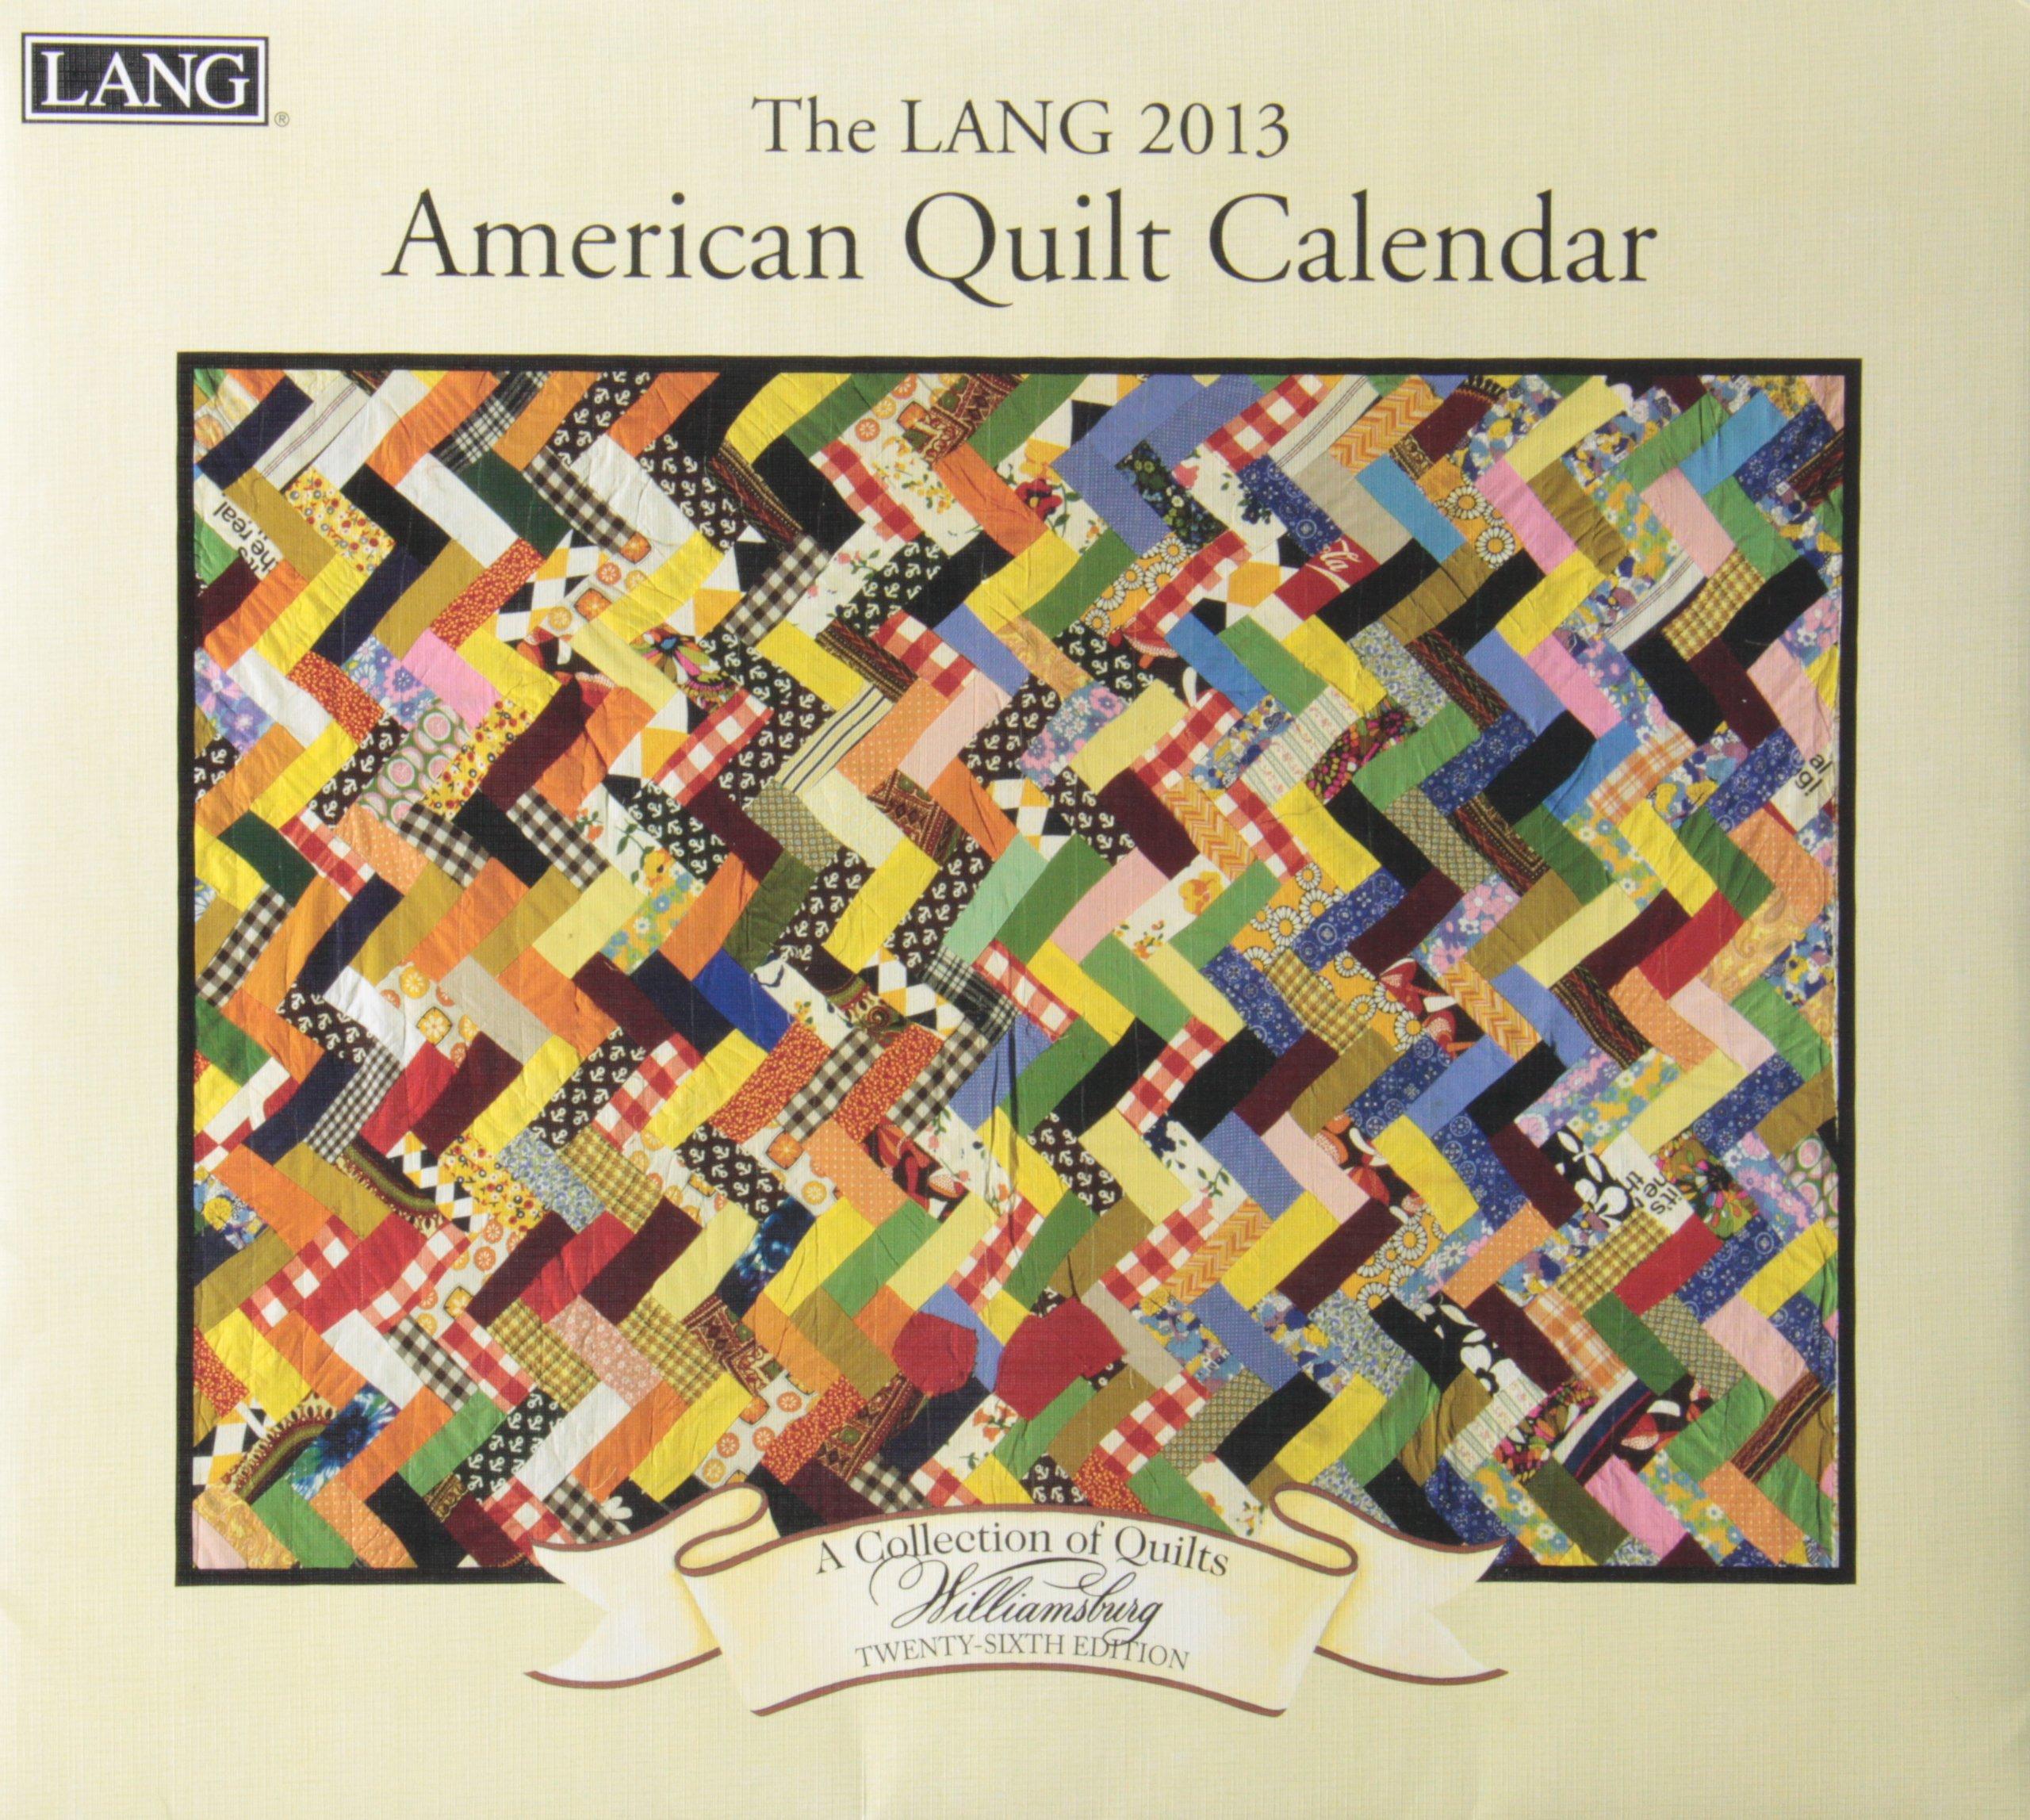 American Quilt Calendar 2013 (Willimasburg)